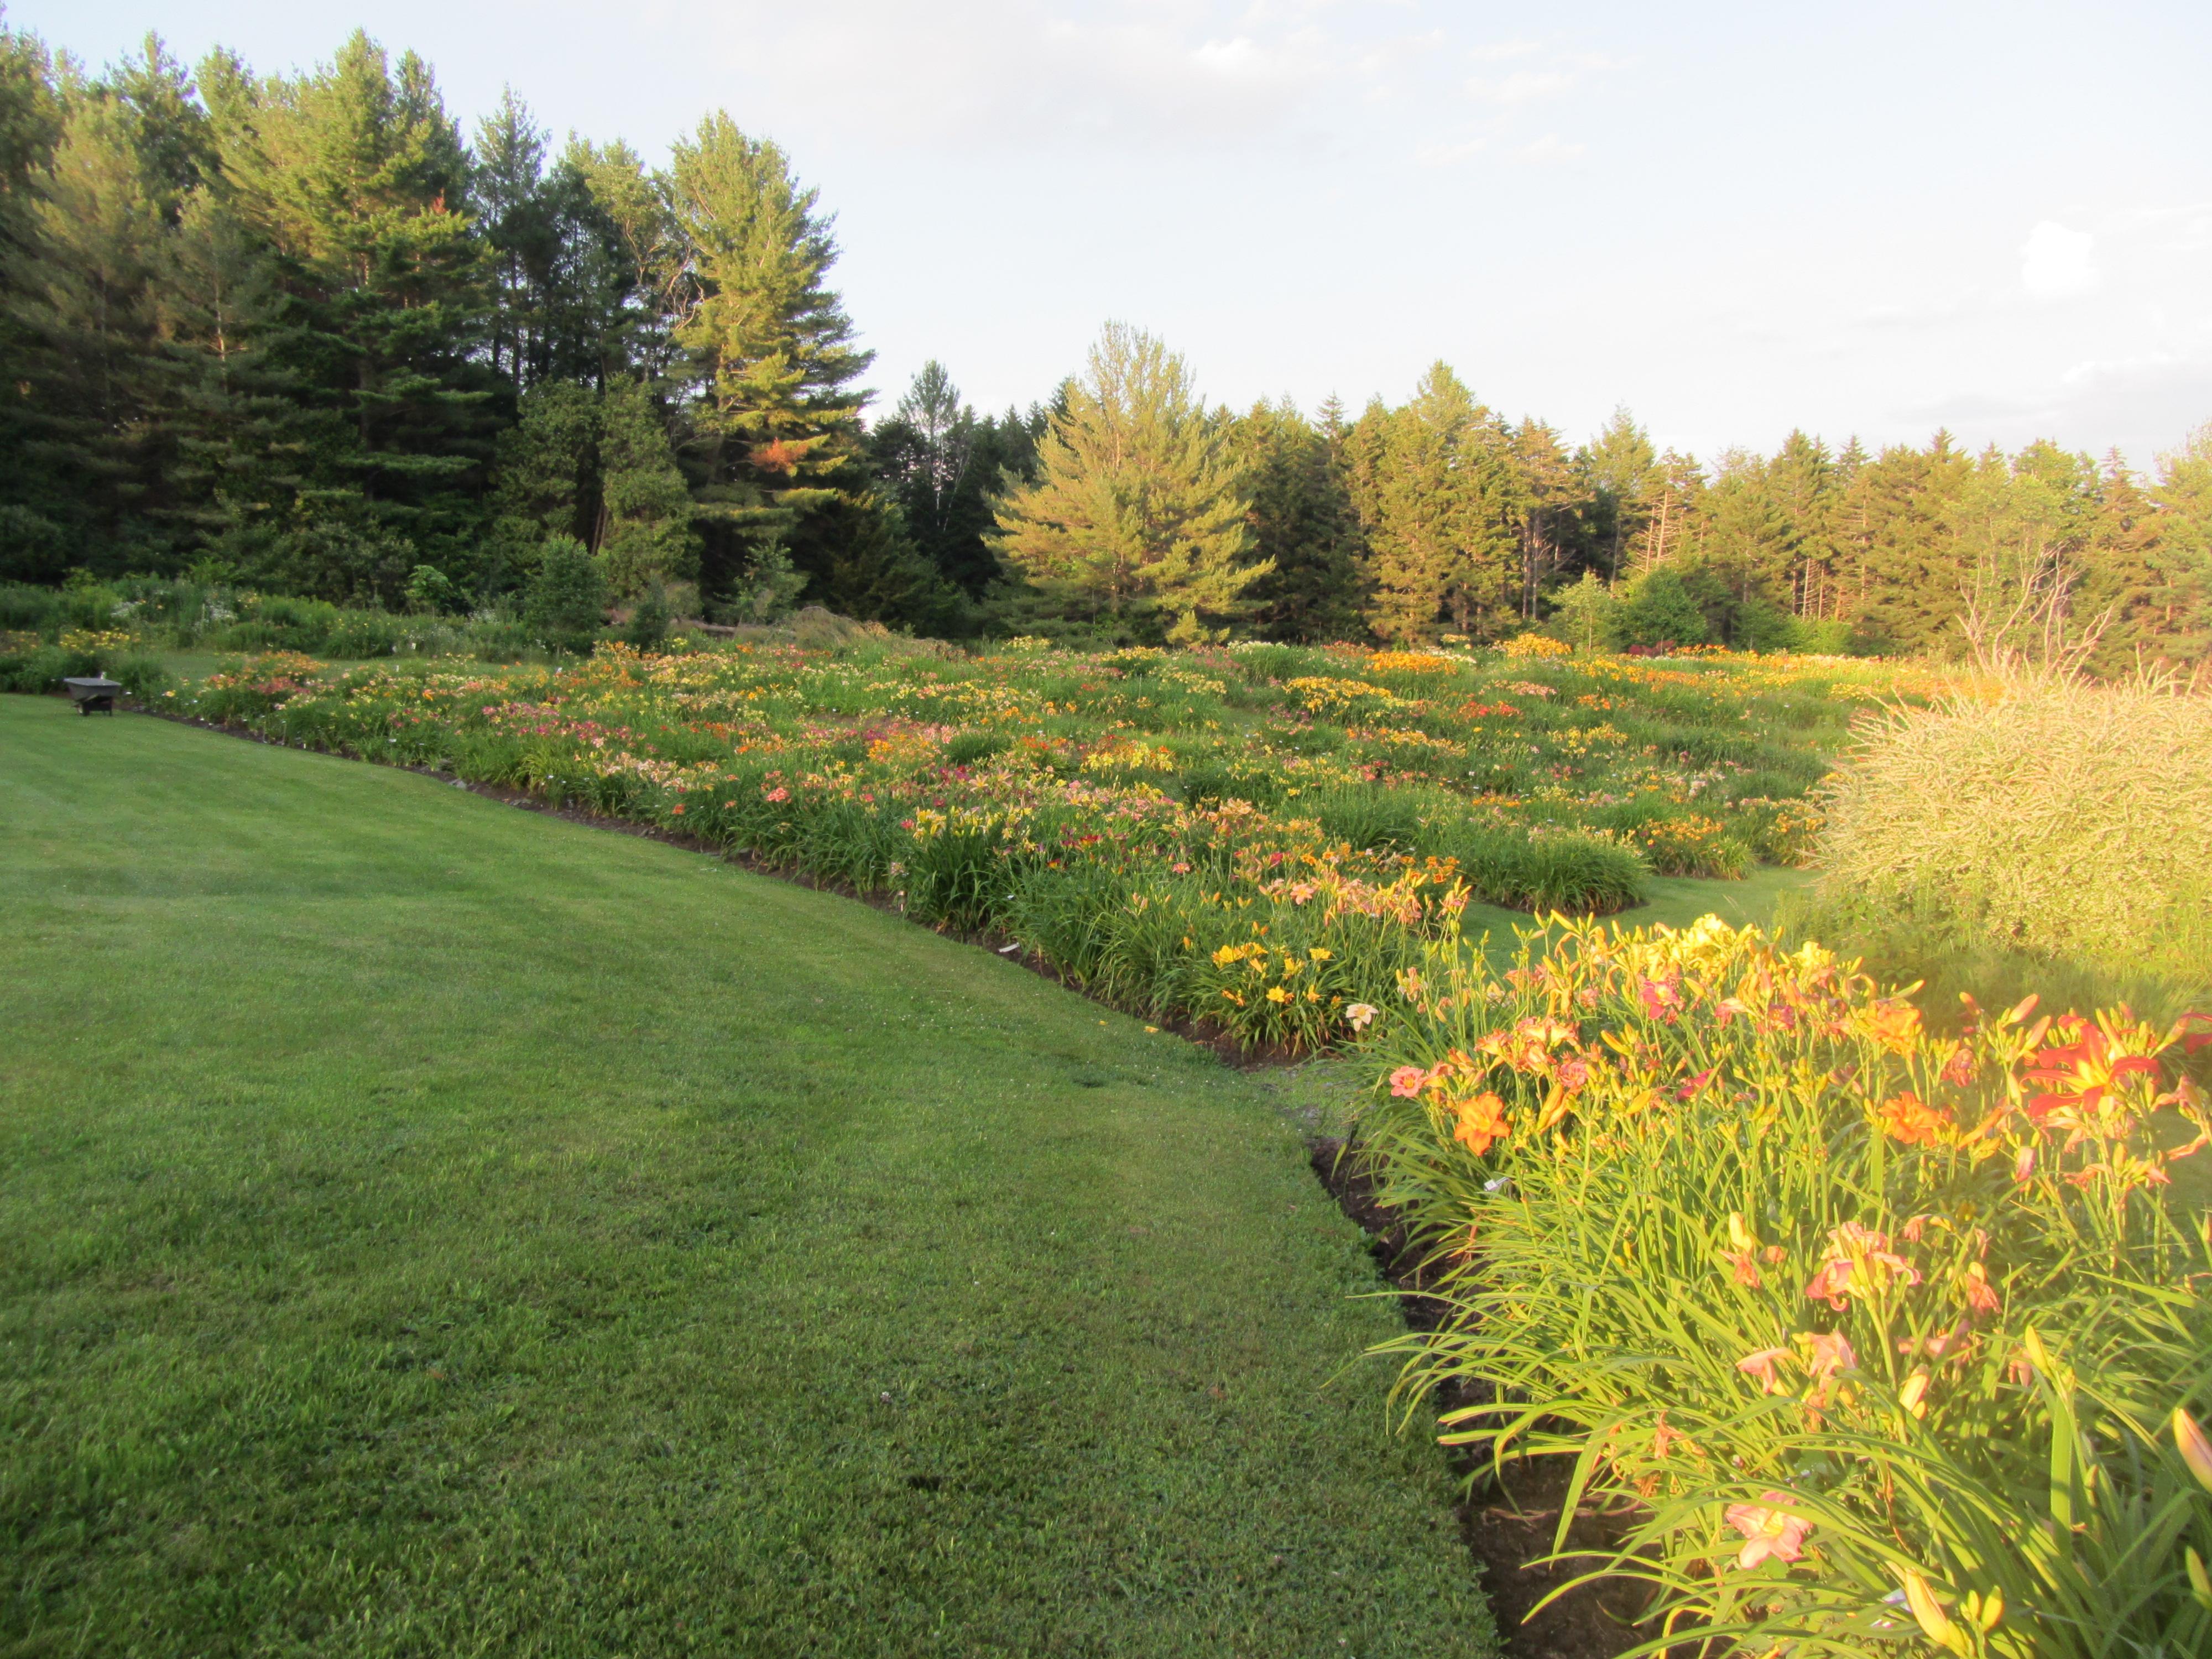 Daylily field